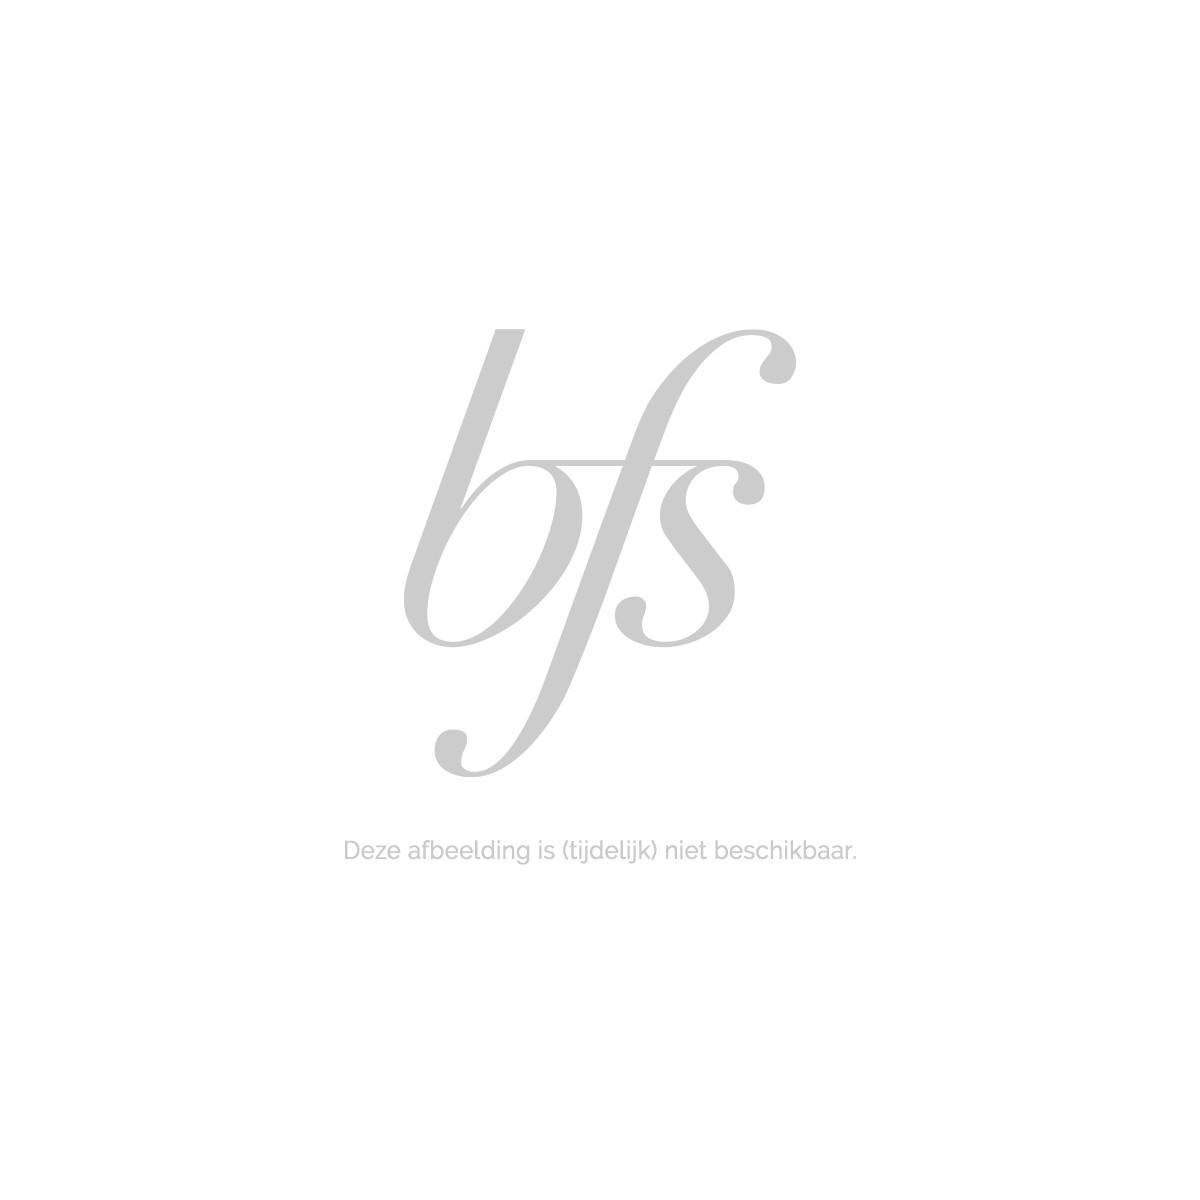 Hildegard Braukmann Sun and Care Aloe Vera Gesichtscreme SPF 20